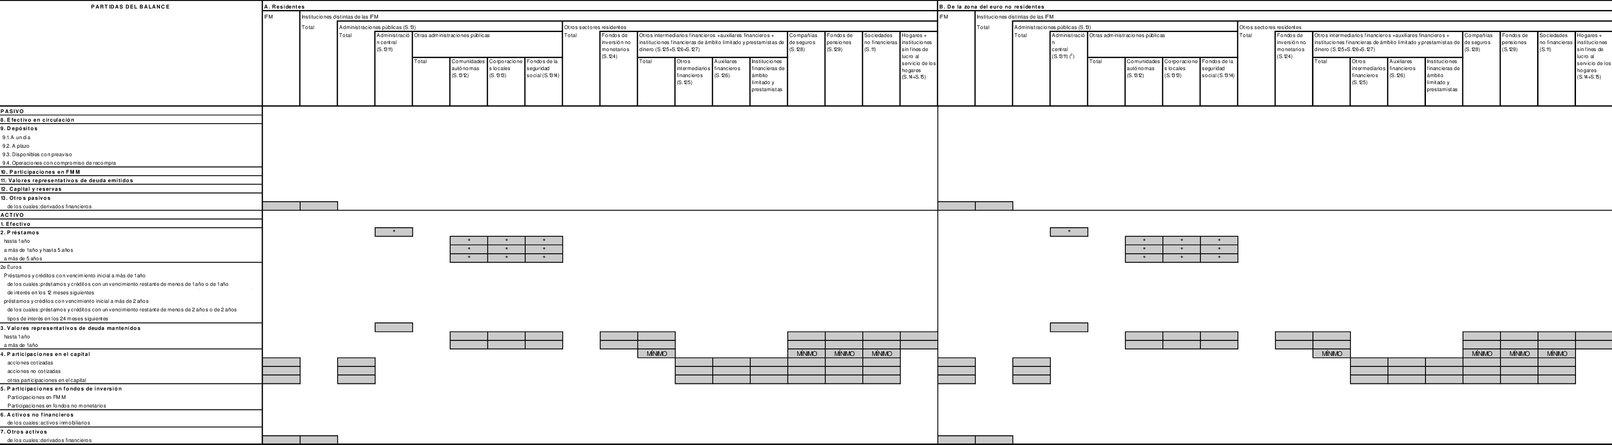 Imagen: http://publications.europa.eu/resource/uriserv/OJ.L_.2021.073.01.0016.01.SPA.xhtml.L_2021073ES.01005201.tif.jpg